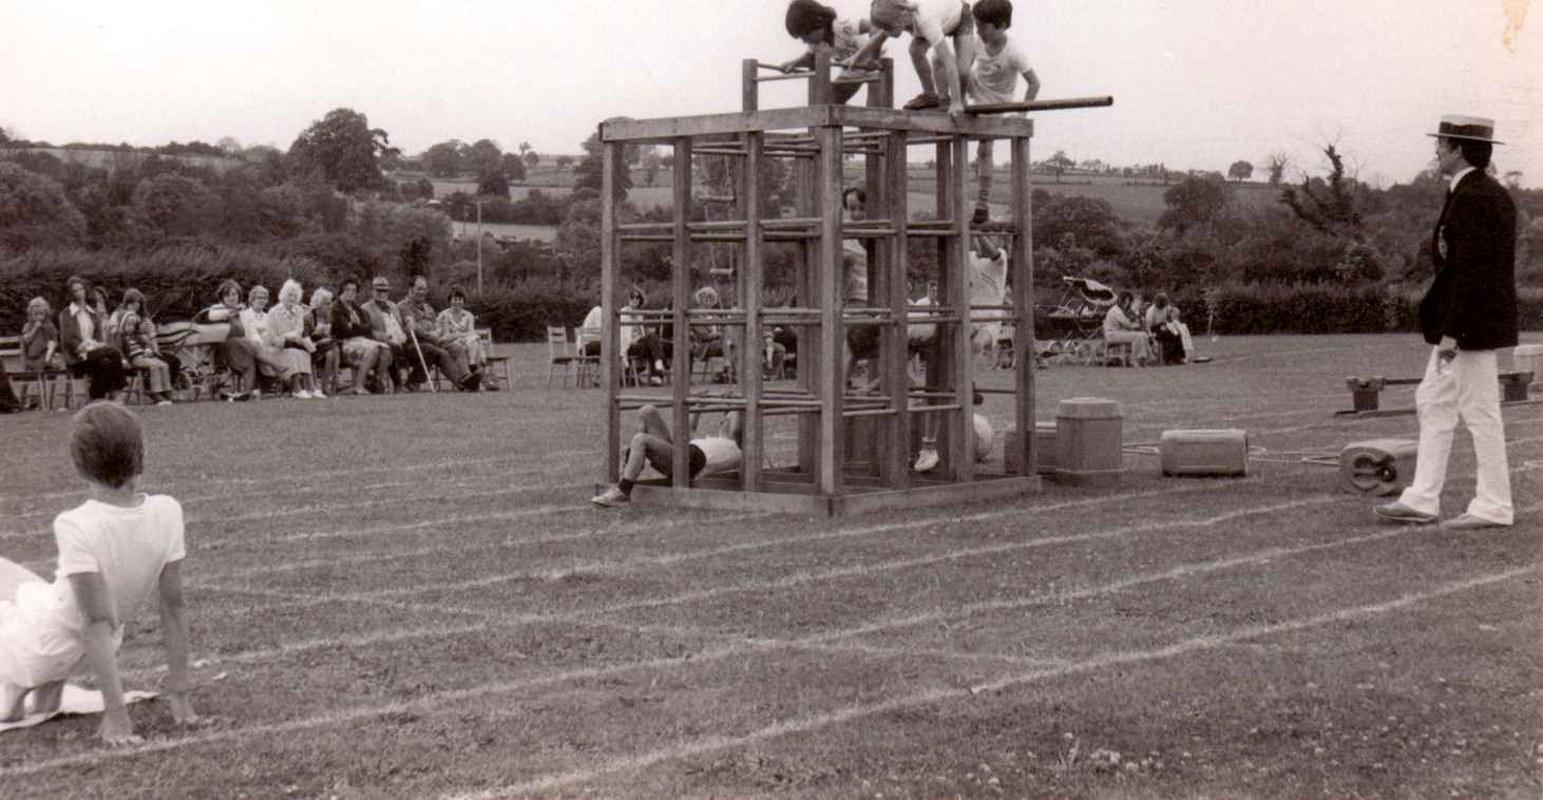 c. 1978 Gymnastics display.